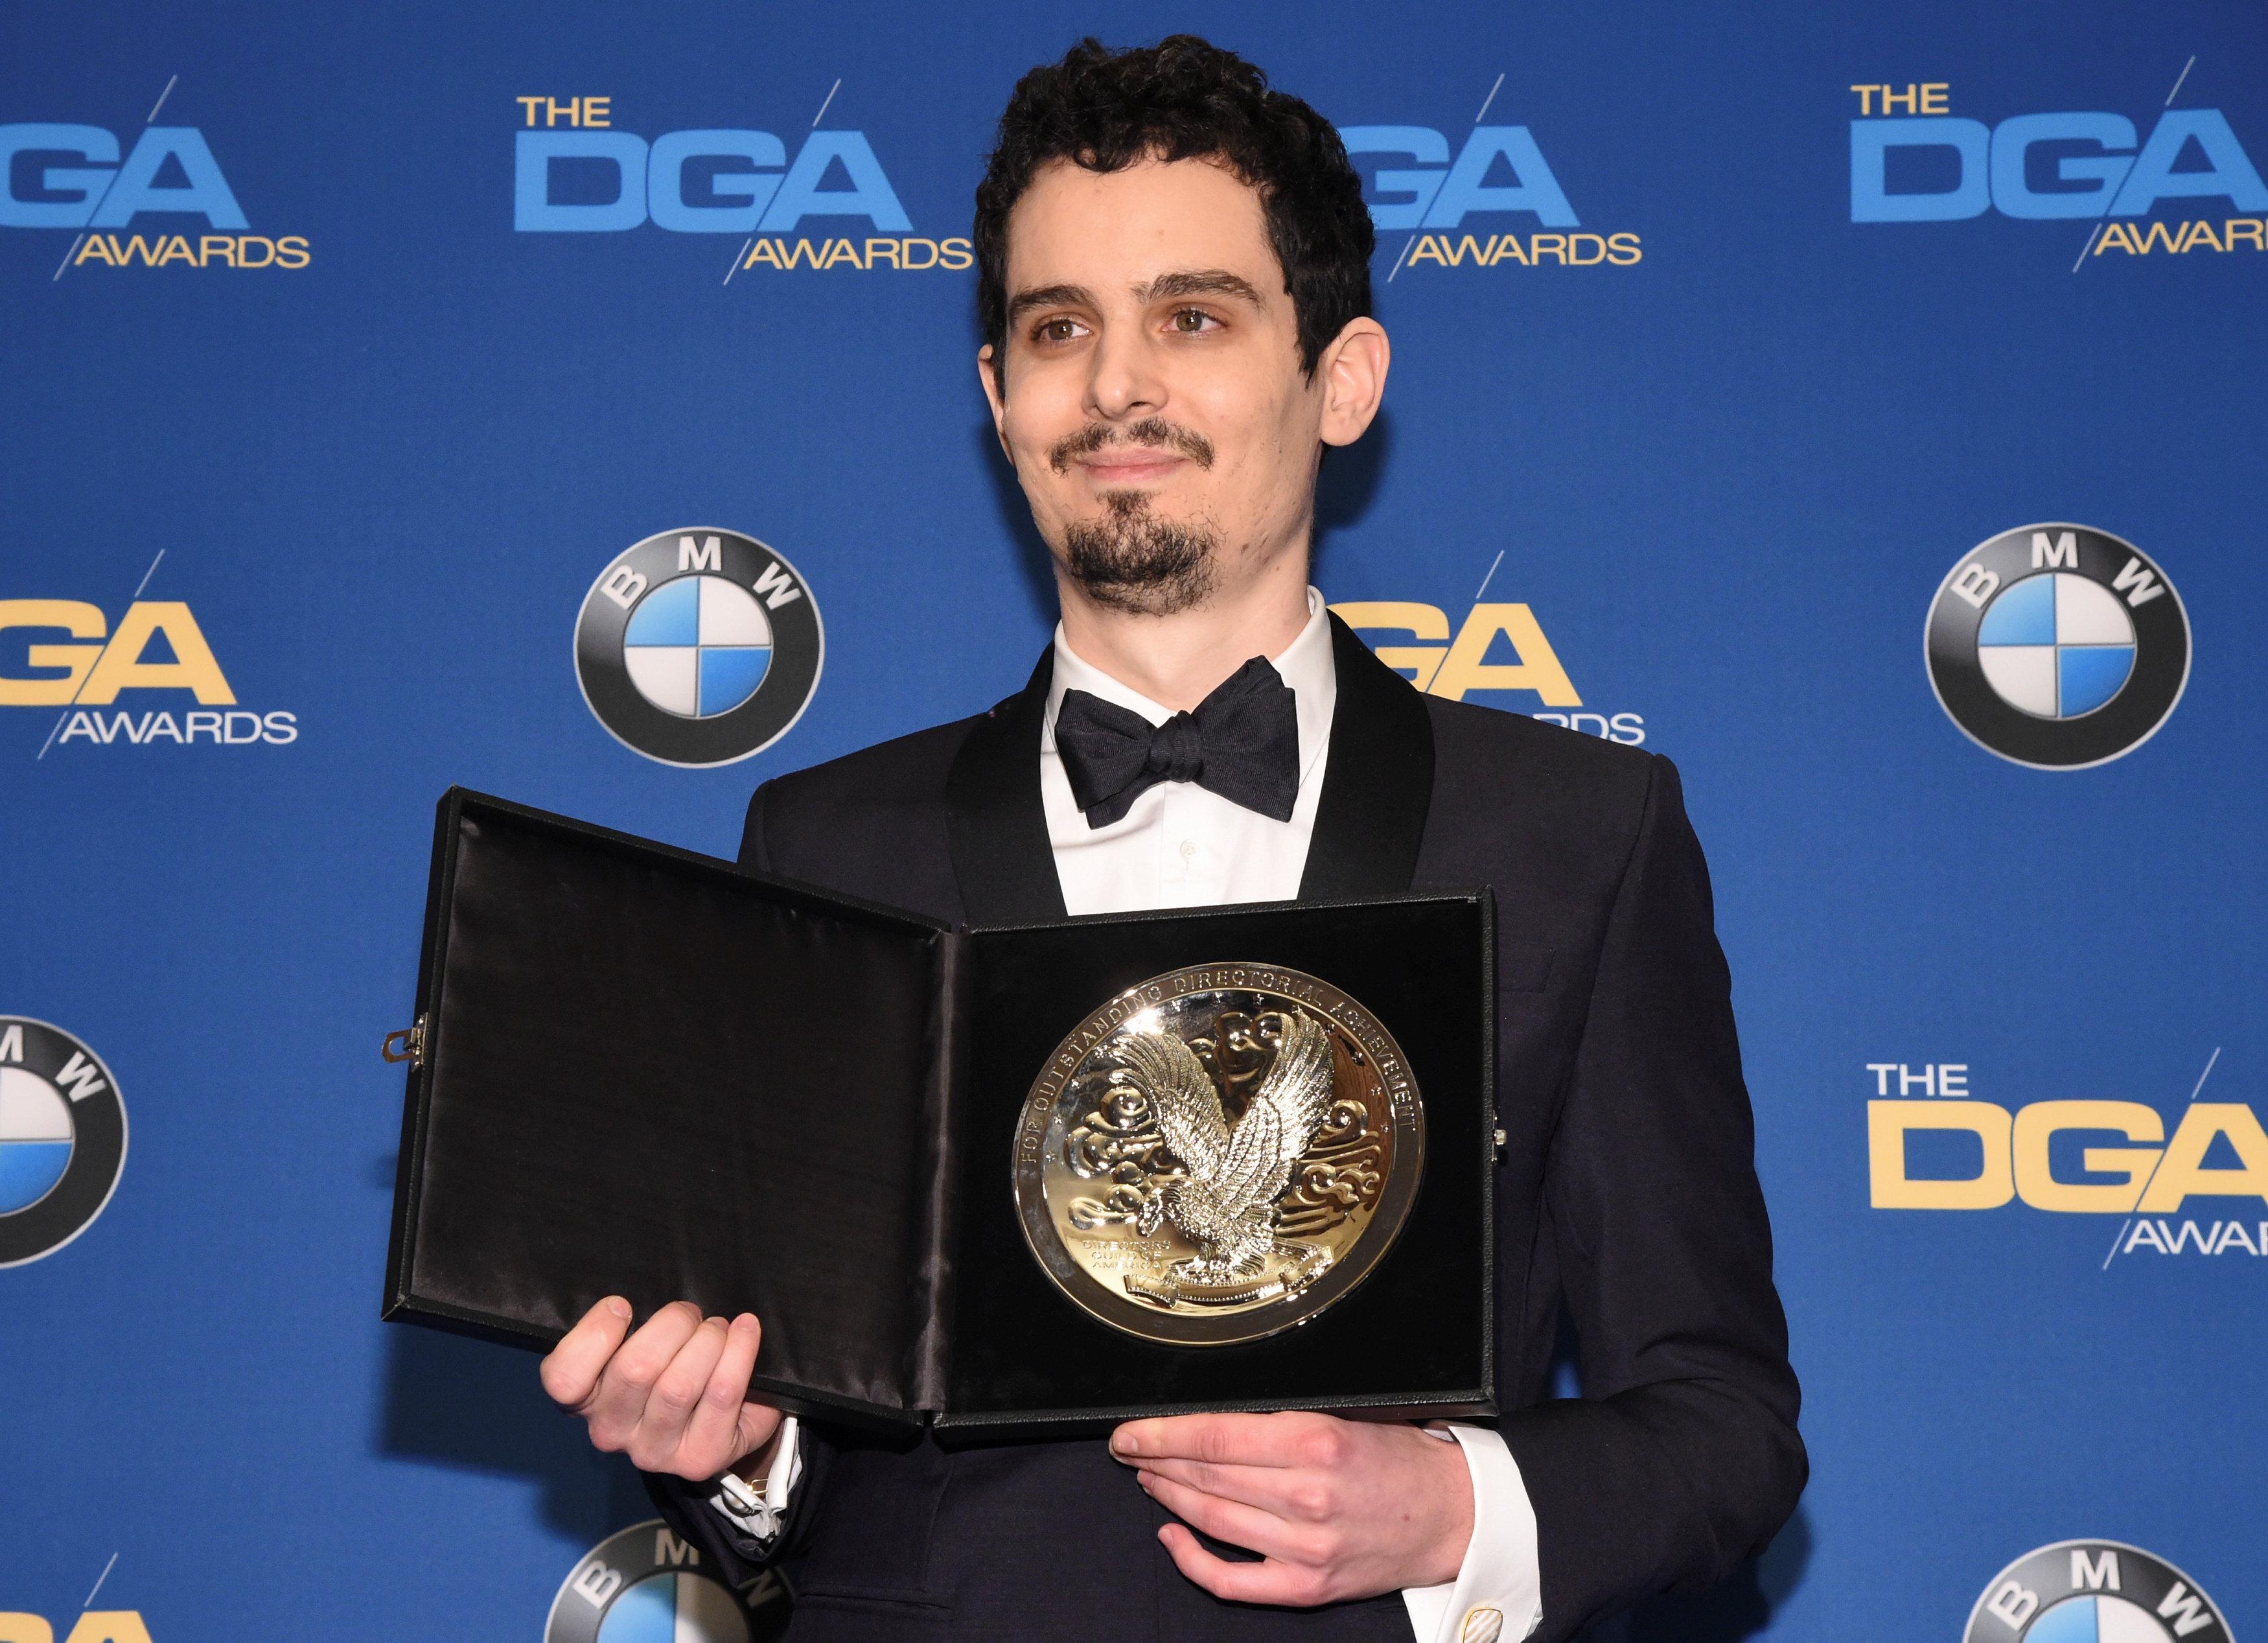 La La Land' director Chazelle wins top DGA award, stoking